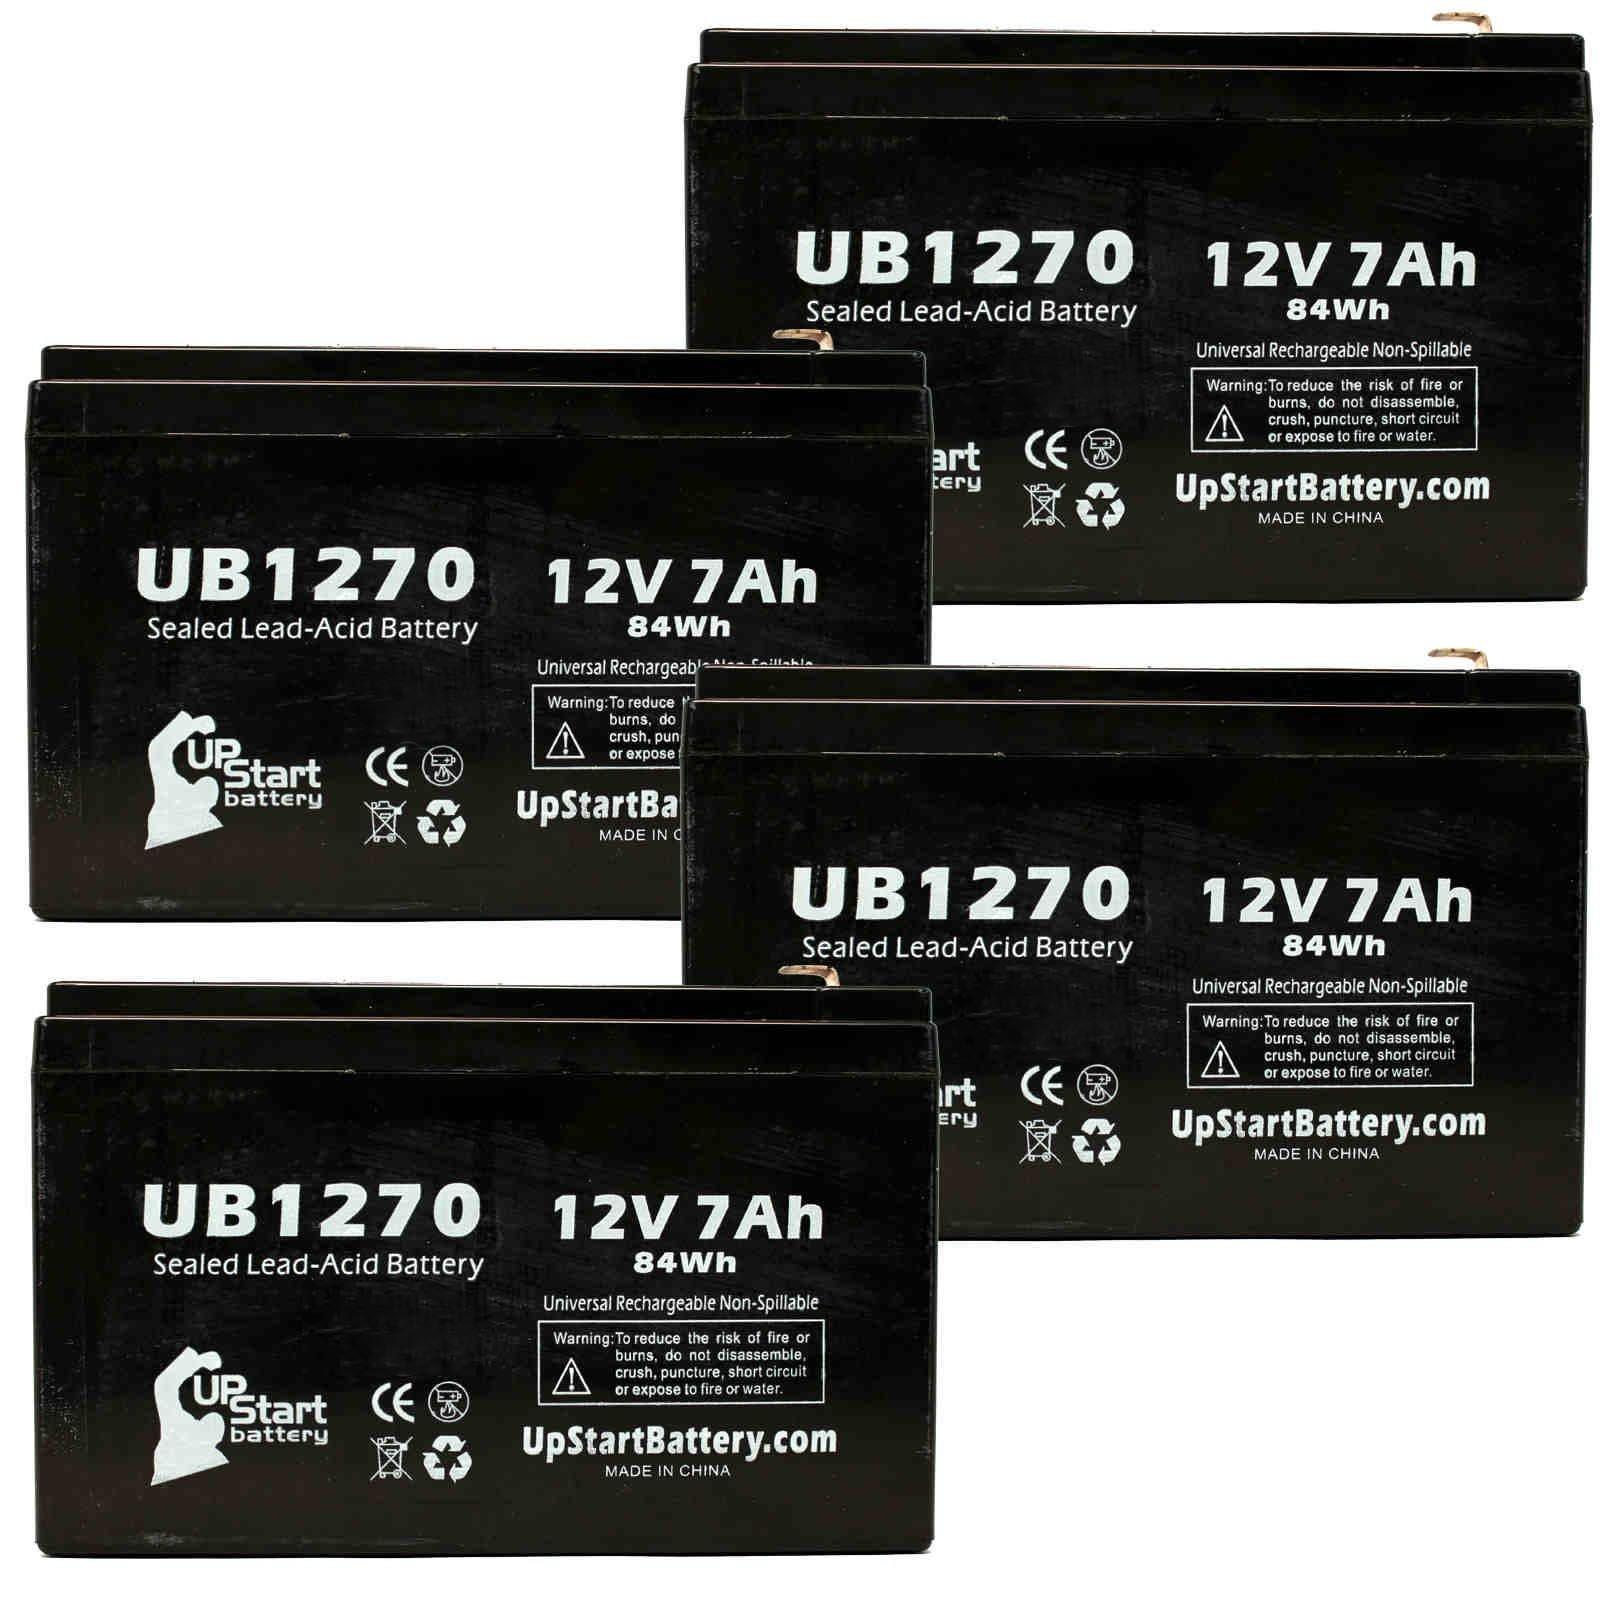 4x Pack - APC SMART-UPS 1500VA USB & SER SUA1500RMUS Battery - Replacement UB1270 Universal Sealed Lead Acid Battery (12V, 7Ah, 7000mAh, F1 Terminal, AGM, SLA) - Includes 8 F1 to F2 Terminal Adapters by UpStart Battery (Image #1)